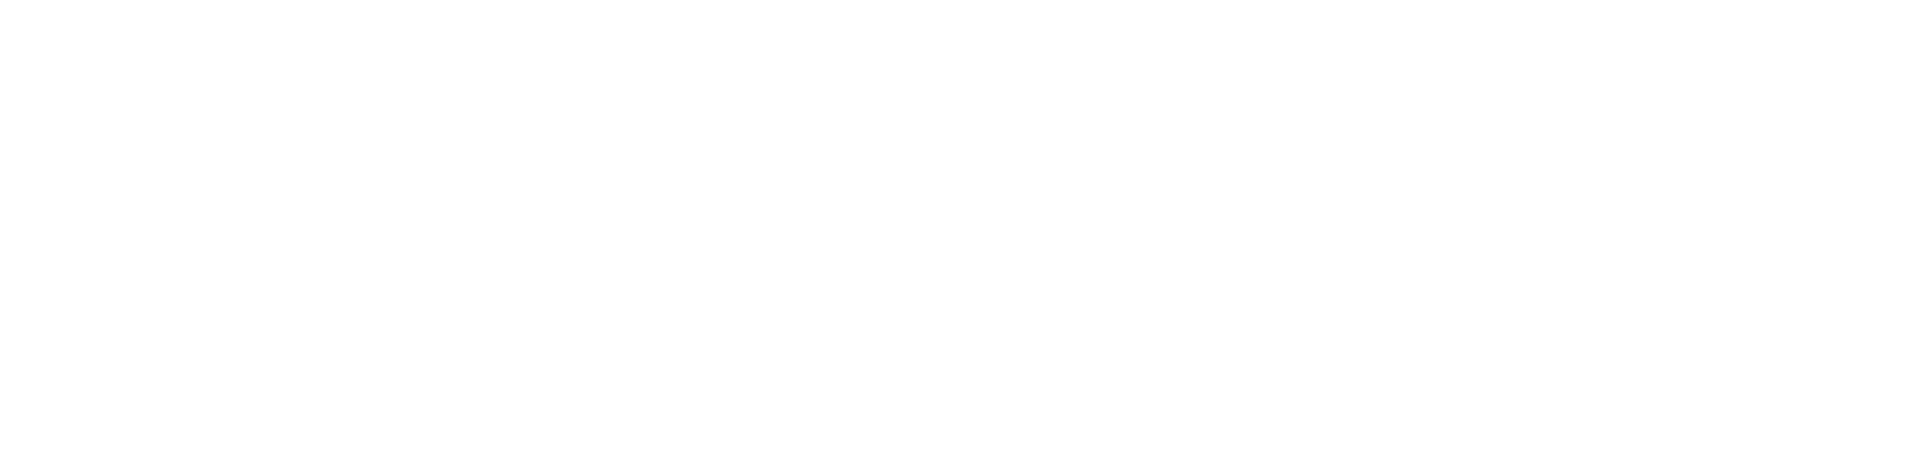 PAYCIPS Logo